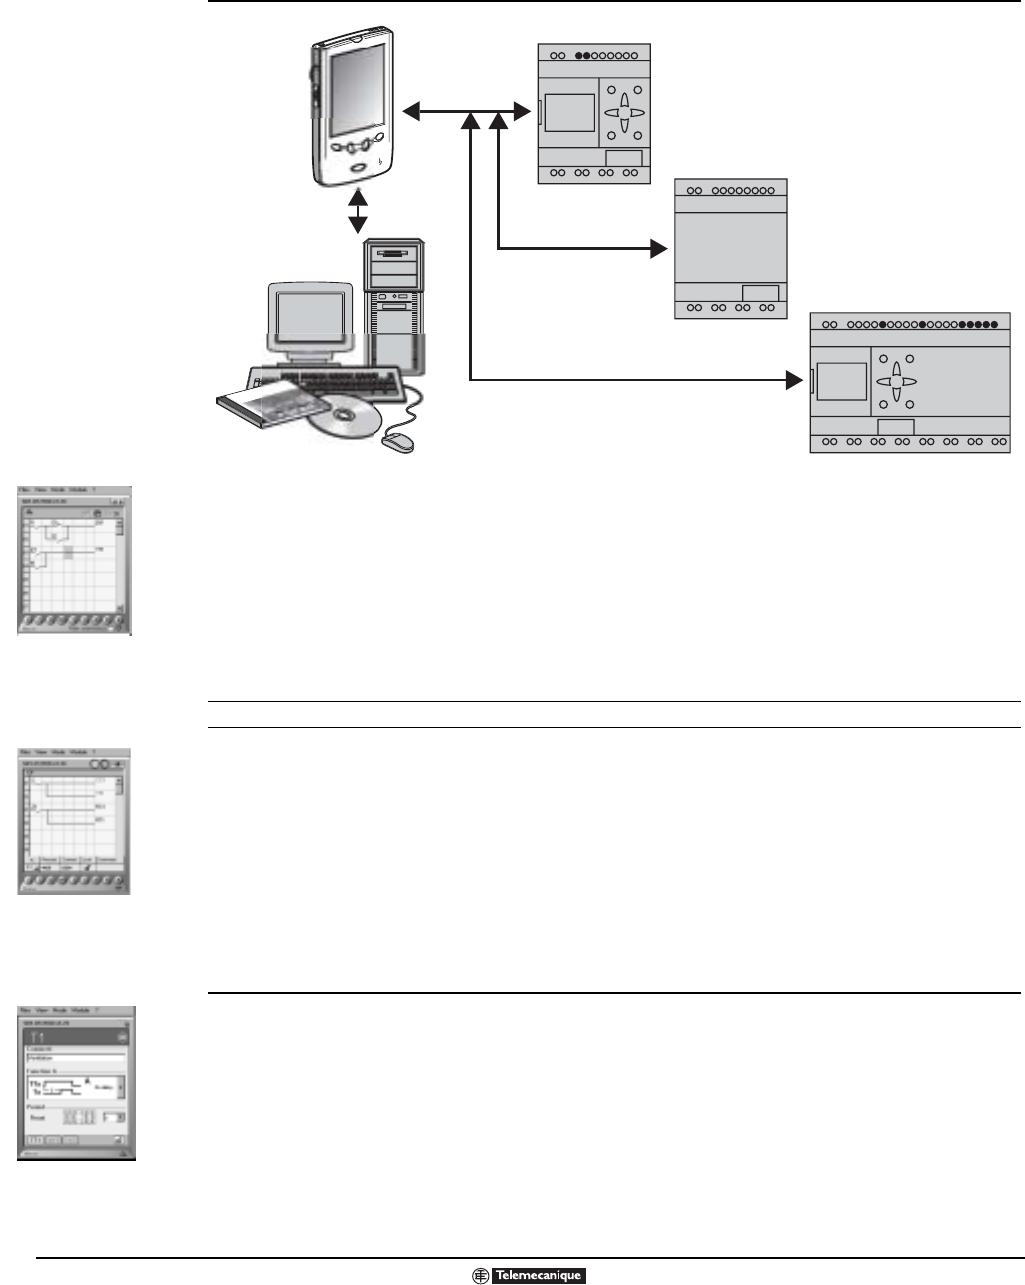 Zelio Logic Relays Sr1 Brochure Telemecanique Wiring Diagram Relay